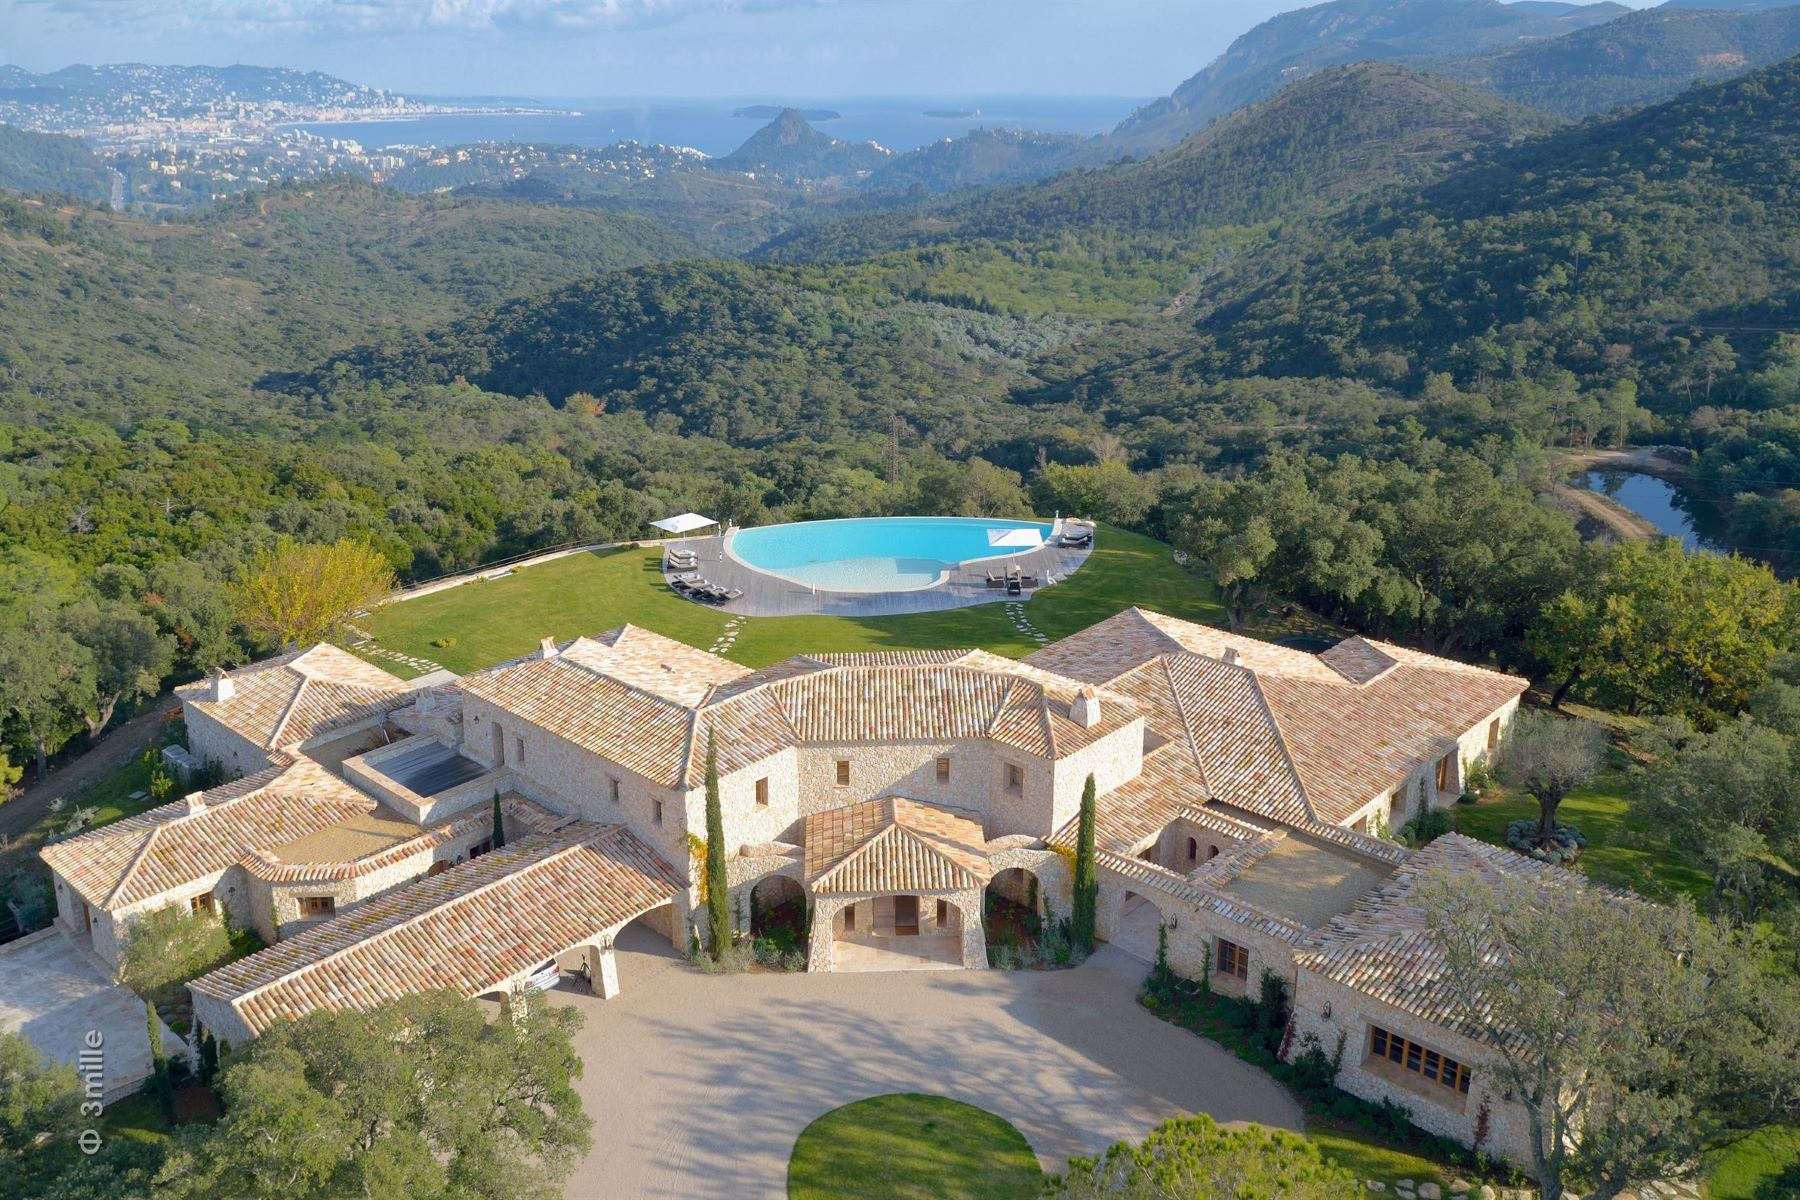 Single Family Homes for Sale at Magnificent provencal domain with views over the bay of Cannes - luxury estate Les Adrets De L Esterel, Provence-Alpes-Cote D'Azur 83600 France